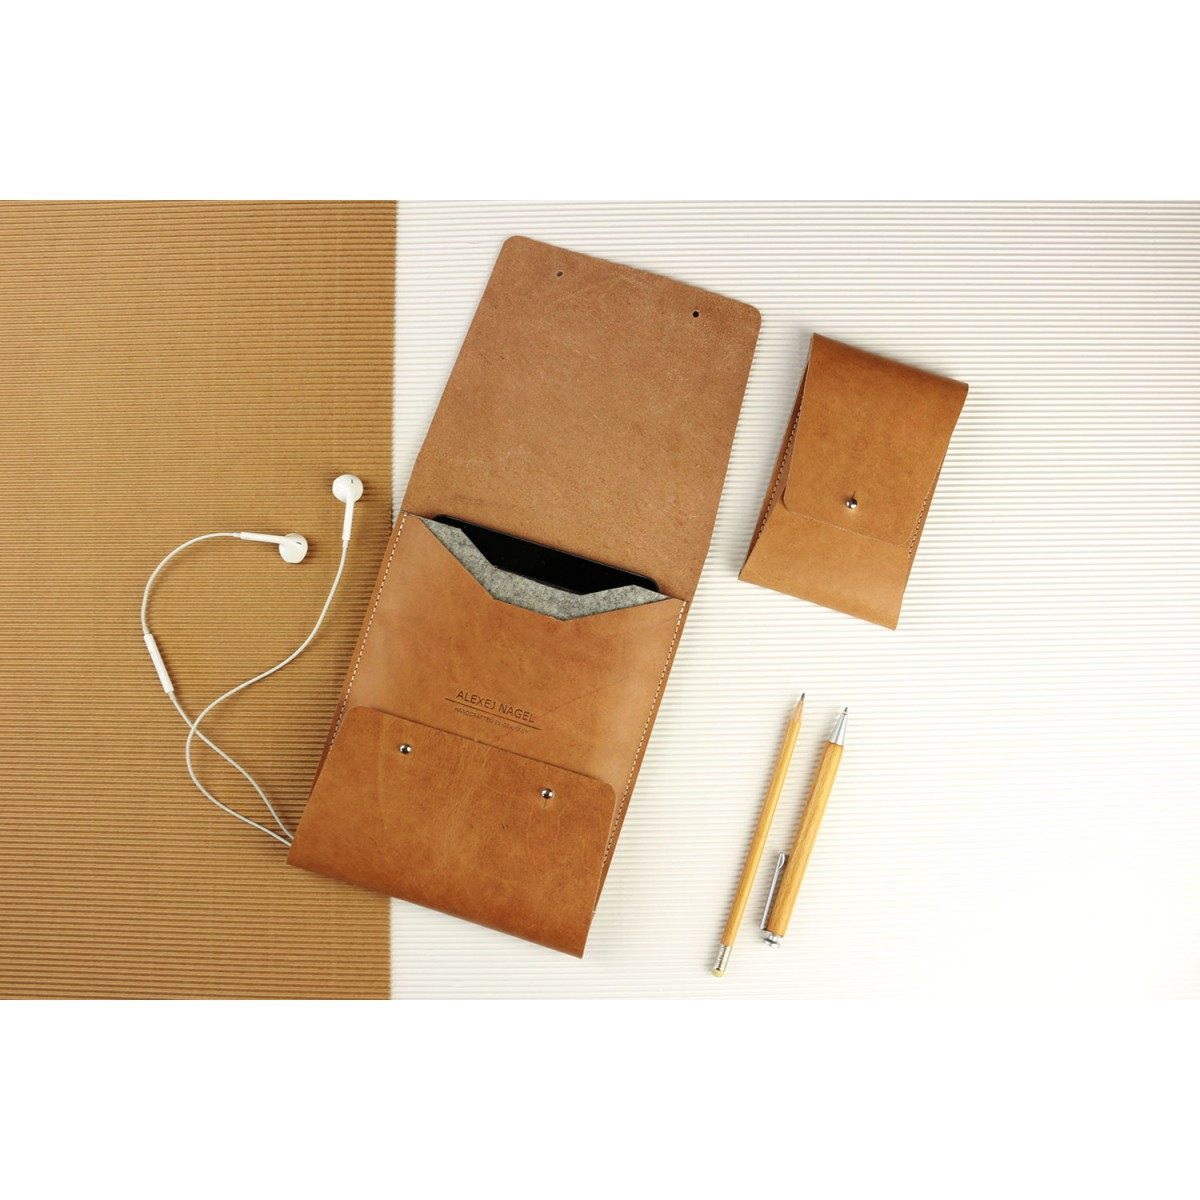 Alexej Nagel Elegante Hülle für iPad Air / Air 2 / Pro aus Vintage Leder [V]